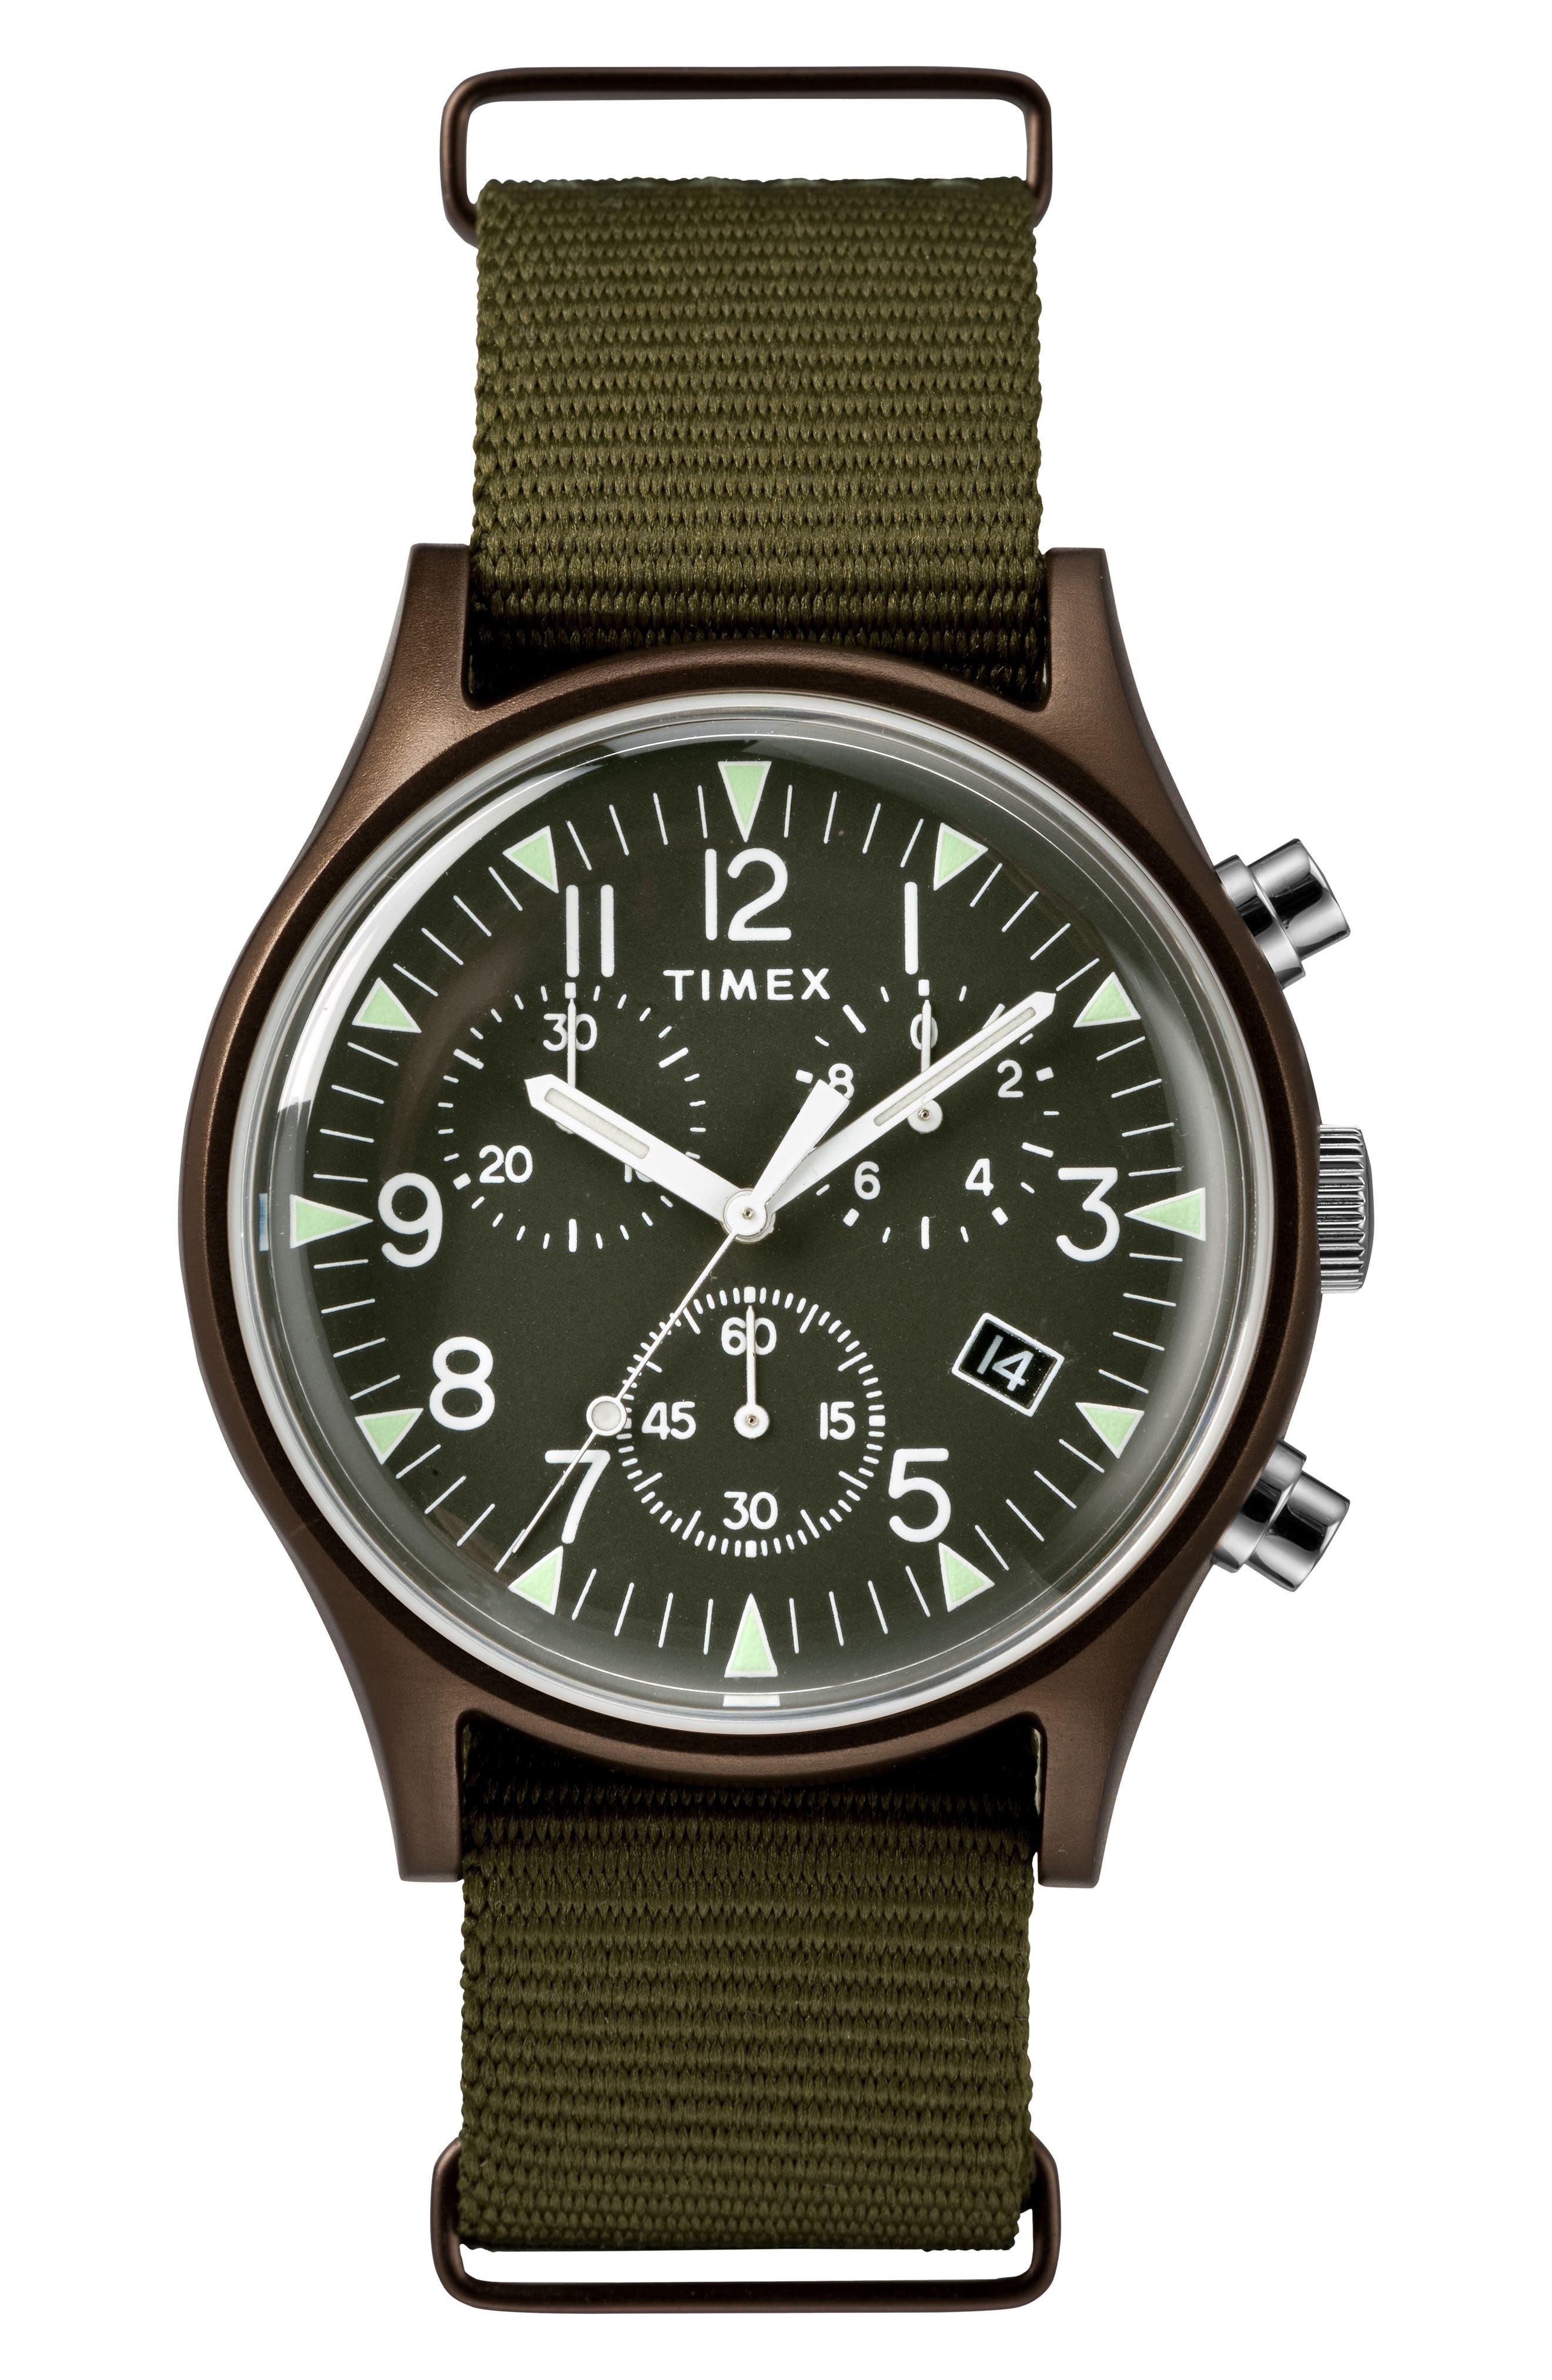 MK1 Chronograph Nylon Strap Watch,                             Main thumbnail 1, color,                             OLIVE